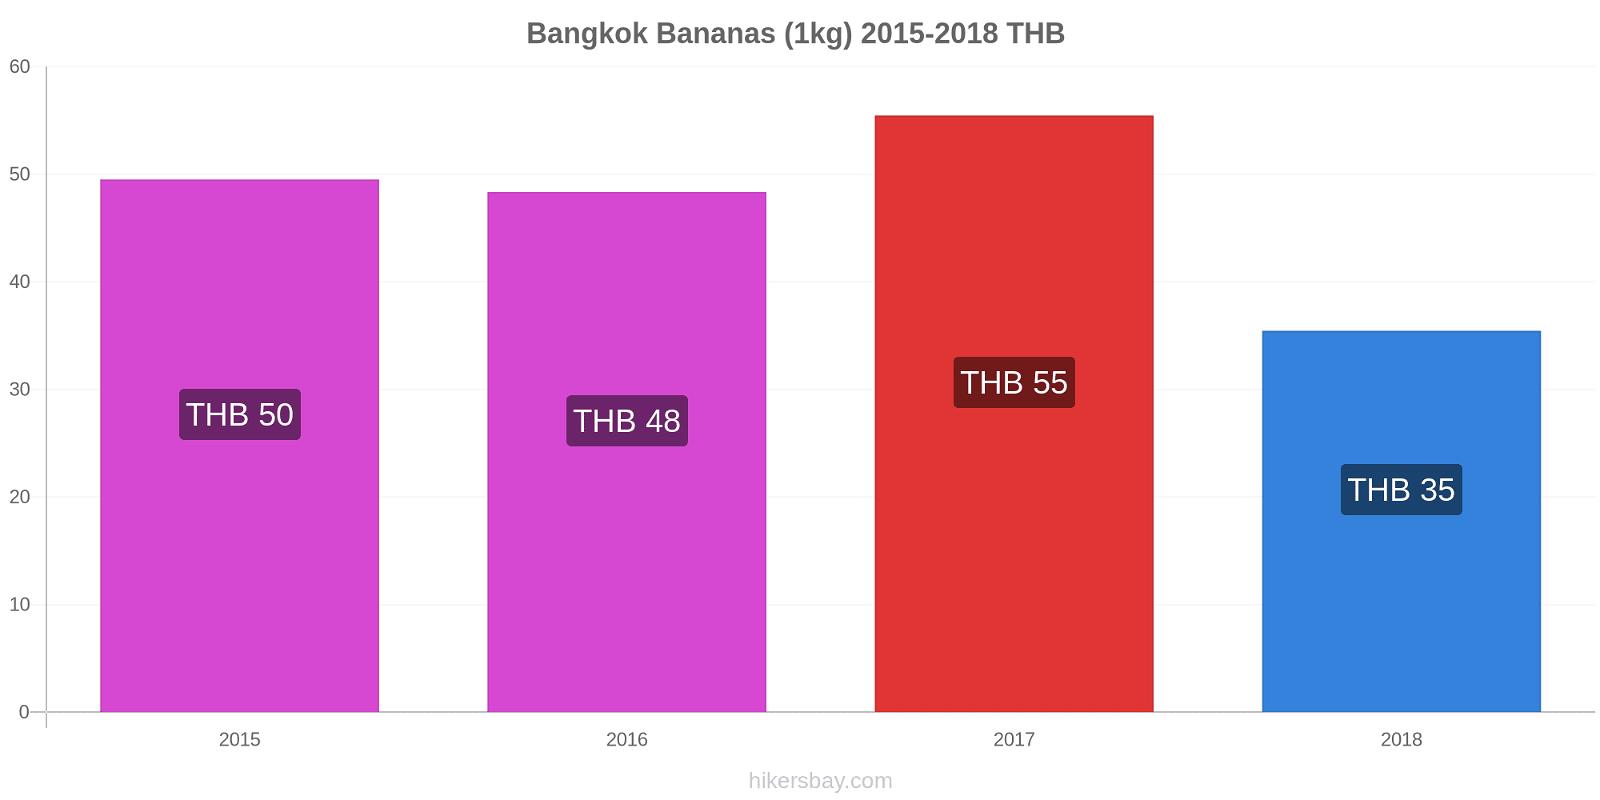 Bangkok price changes Bananas (1kg) hikersbay.com